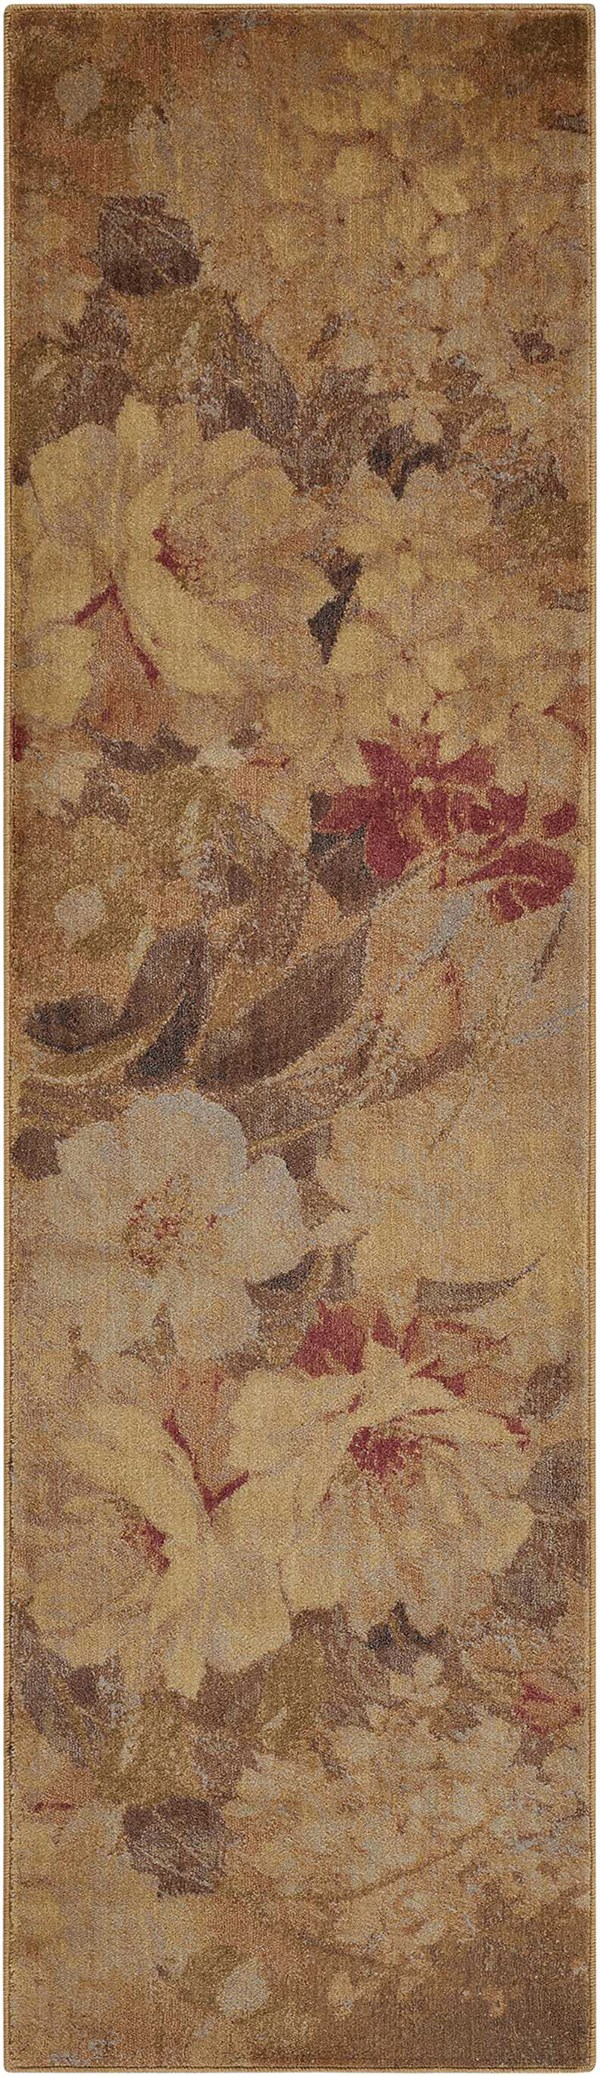 Ivory, Rust Floral / Botanical Area Rug